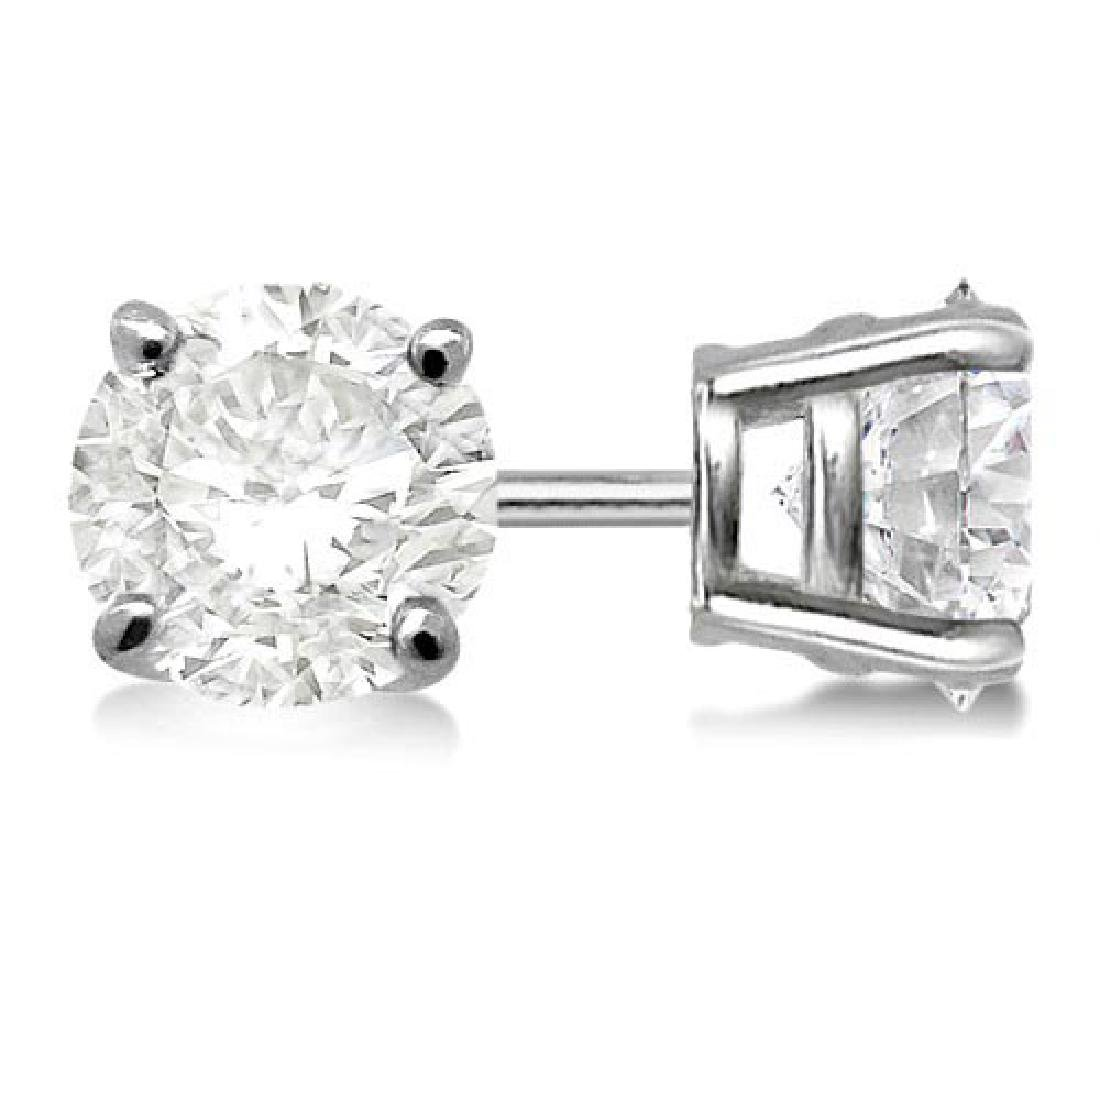 Certified 0.7 CTW Round Diamond Stud Earrings G/SI2